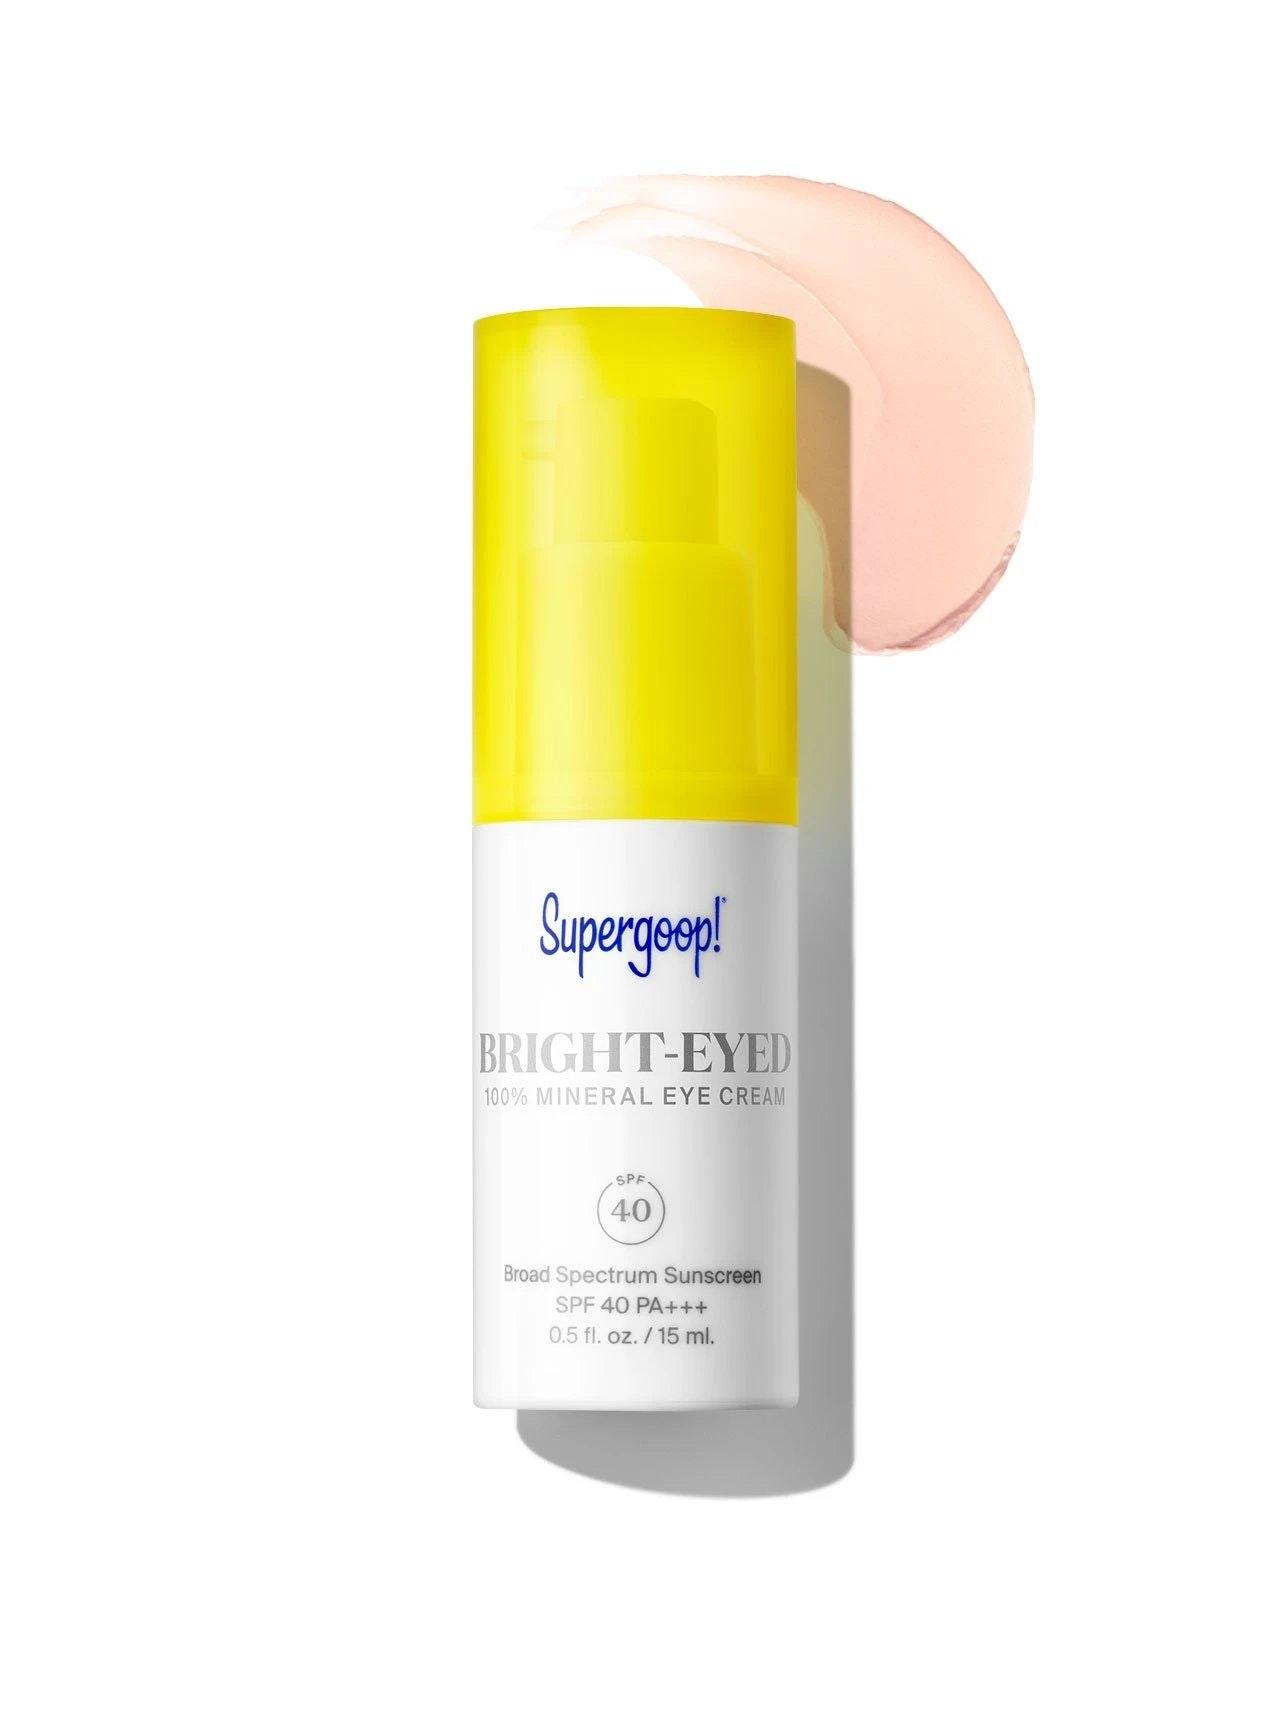 Supergoop! Bright-Eyed 100% Mineral Eye Cream Spf 40